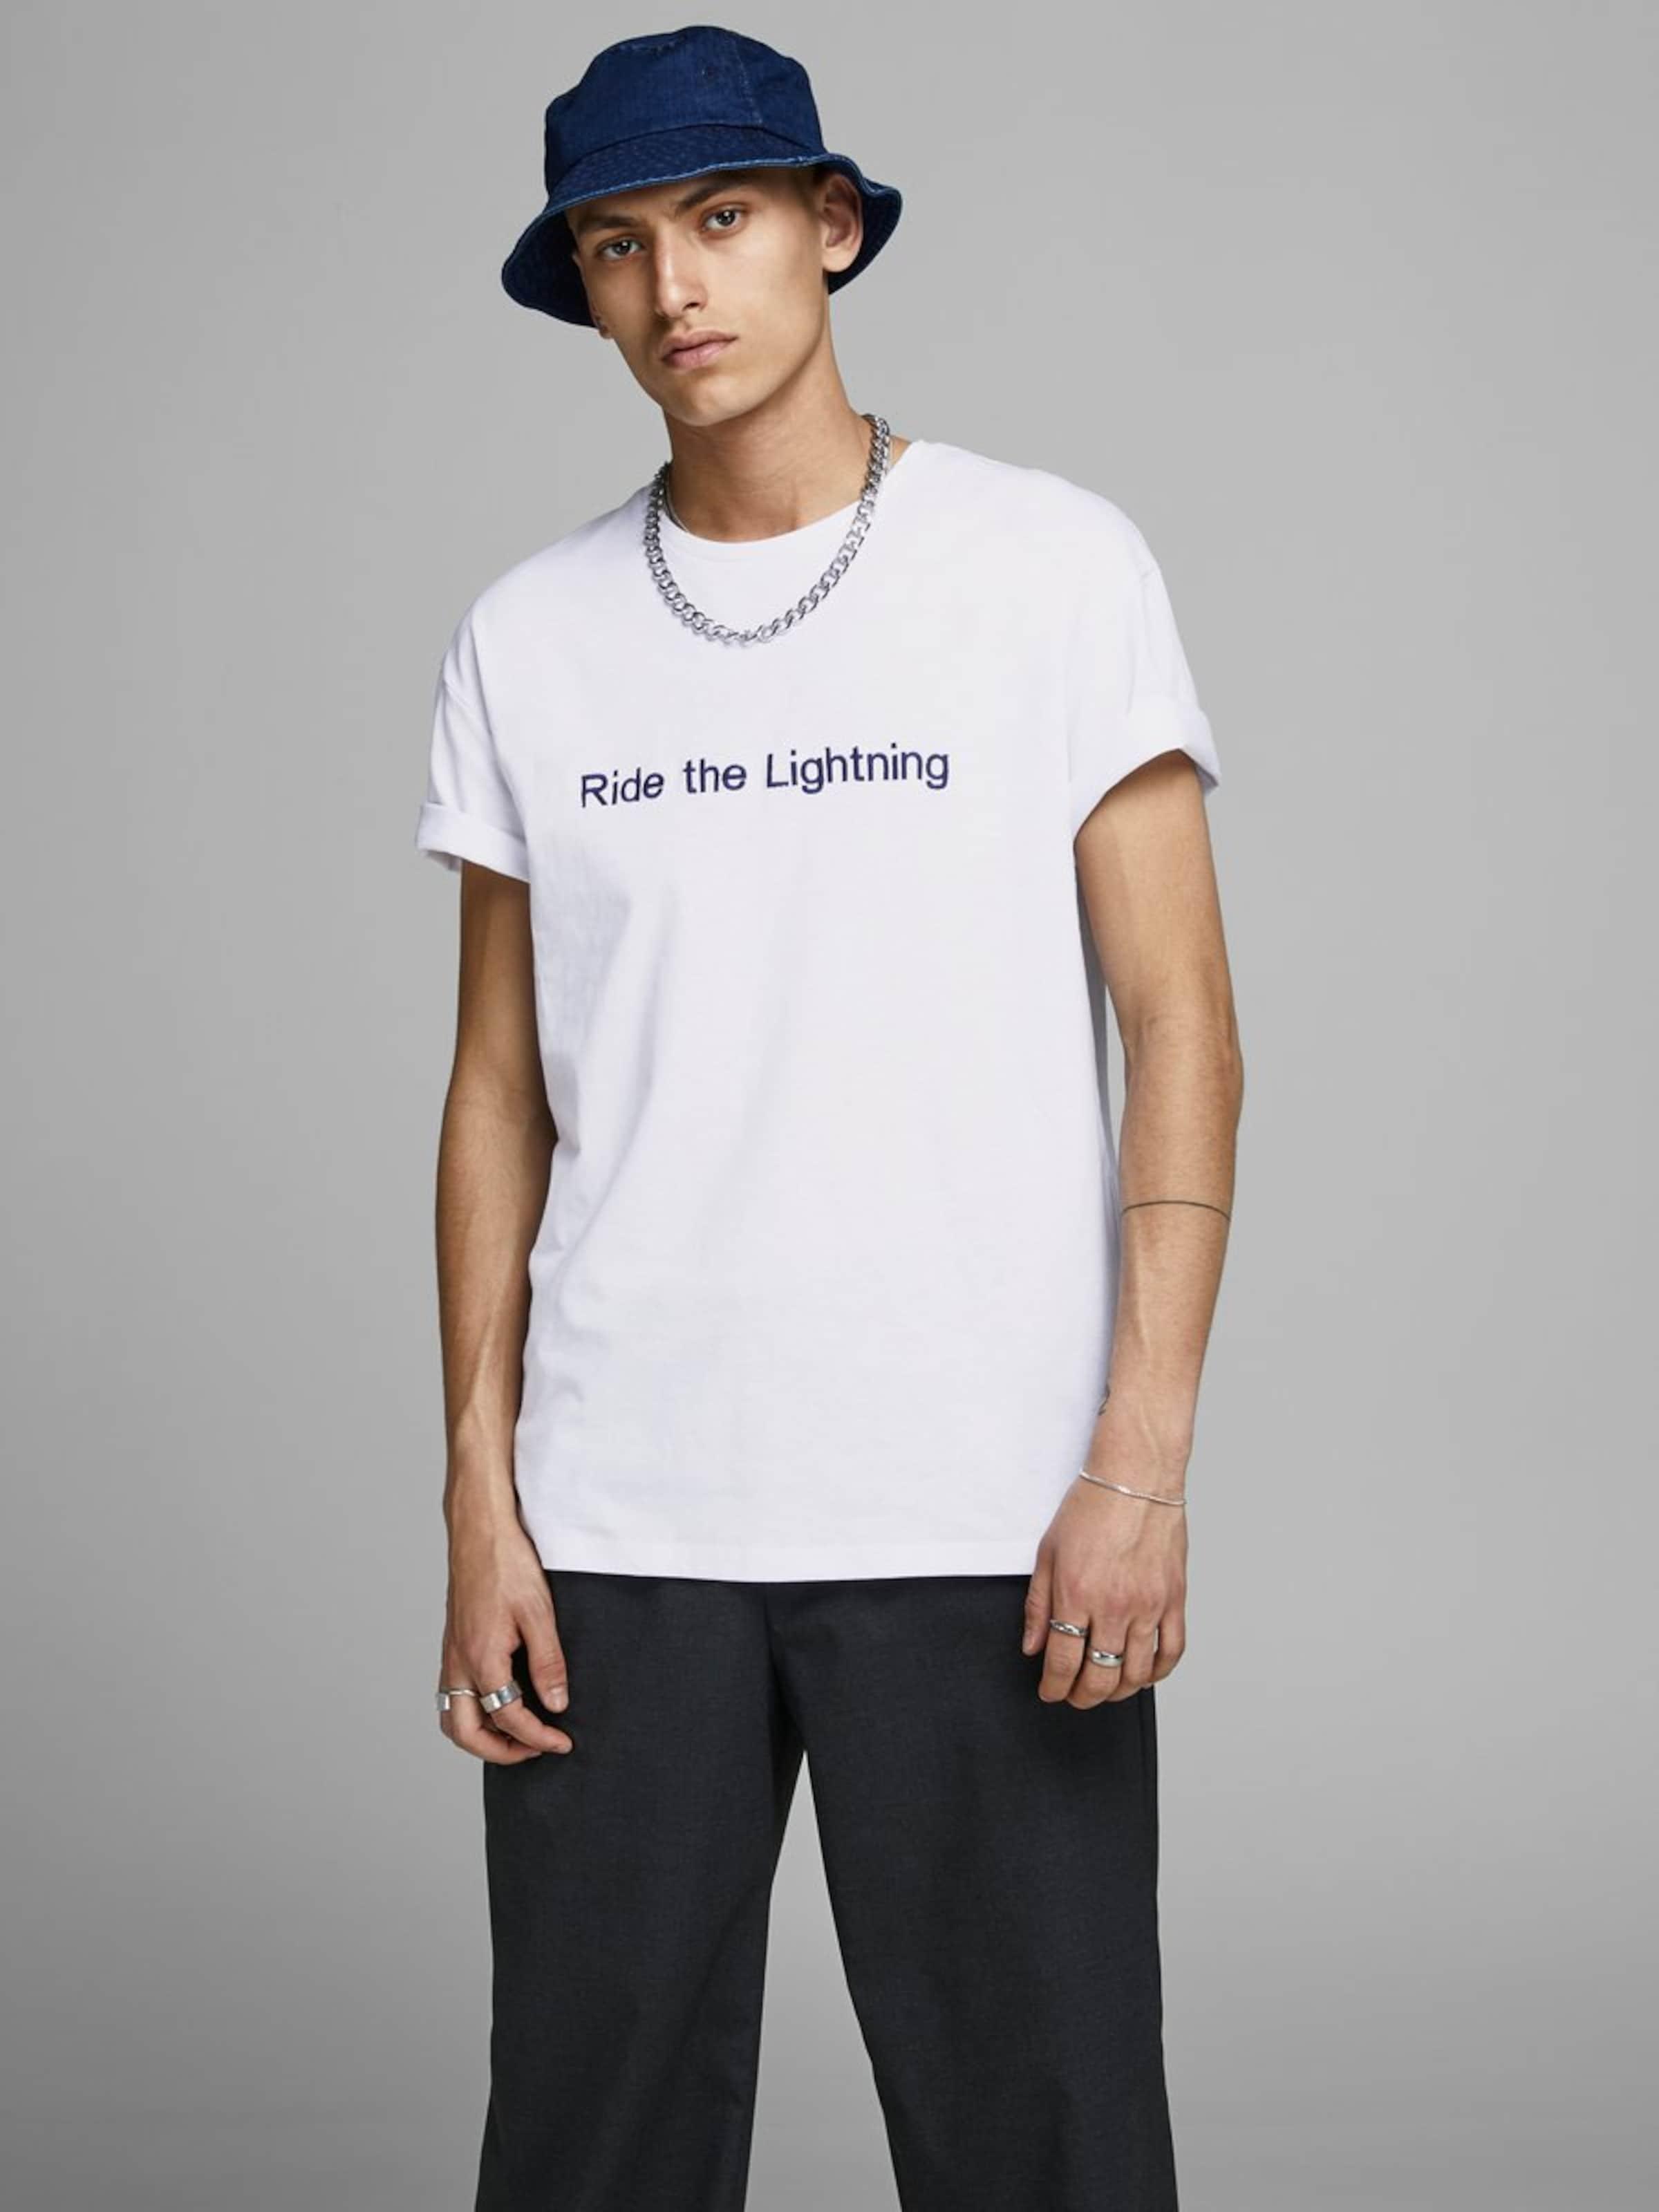 Jackamp; En 'metallica T Jones X' RougeNoir shirt 5Aj4R3L